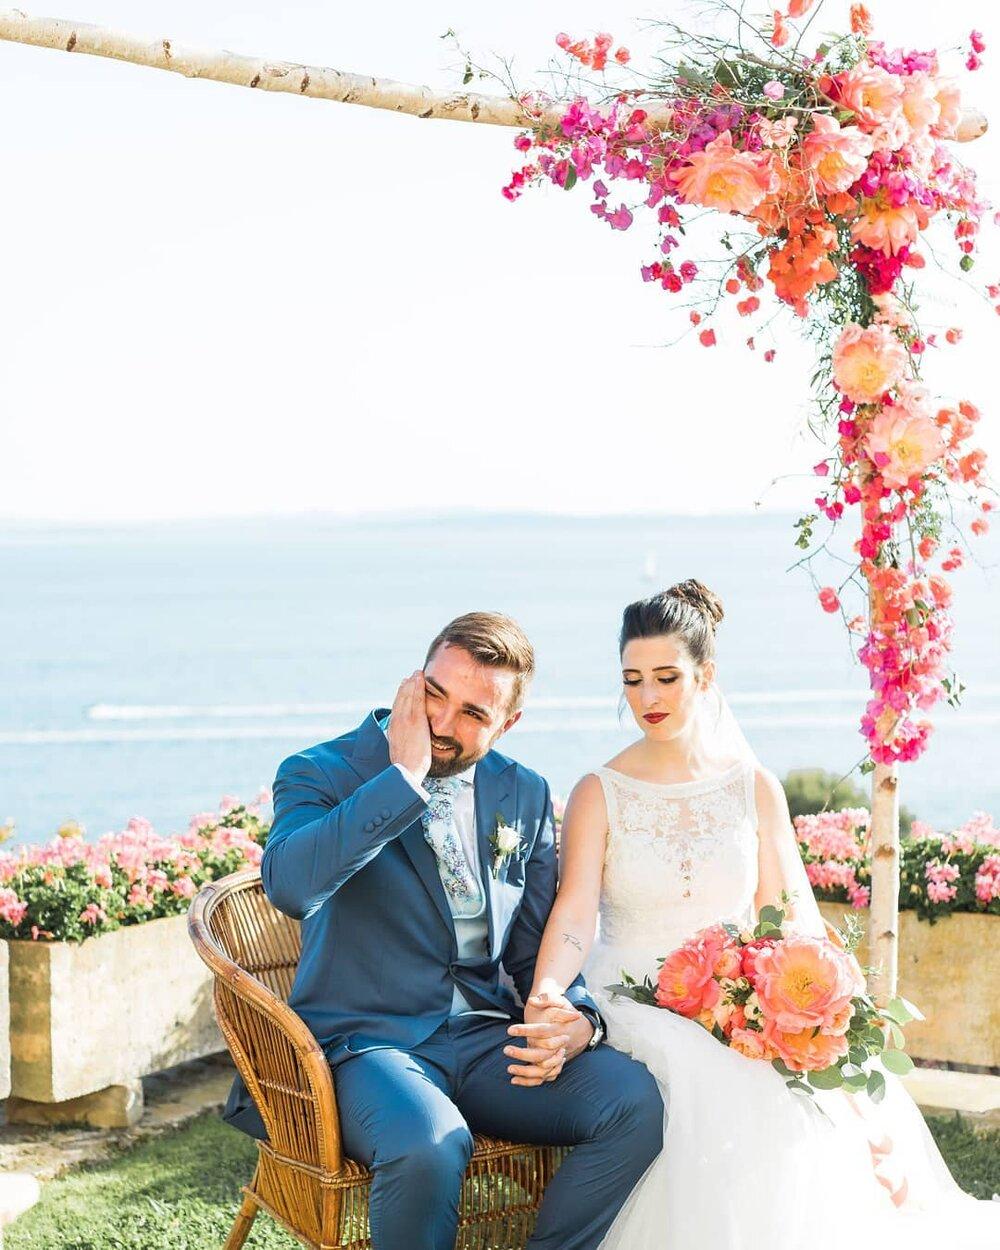 inna-wedding-photographer-barcelona-spain-taylor-content.jpg